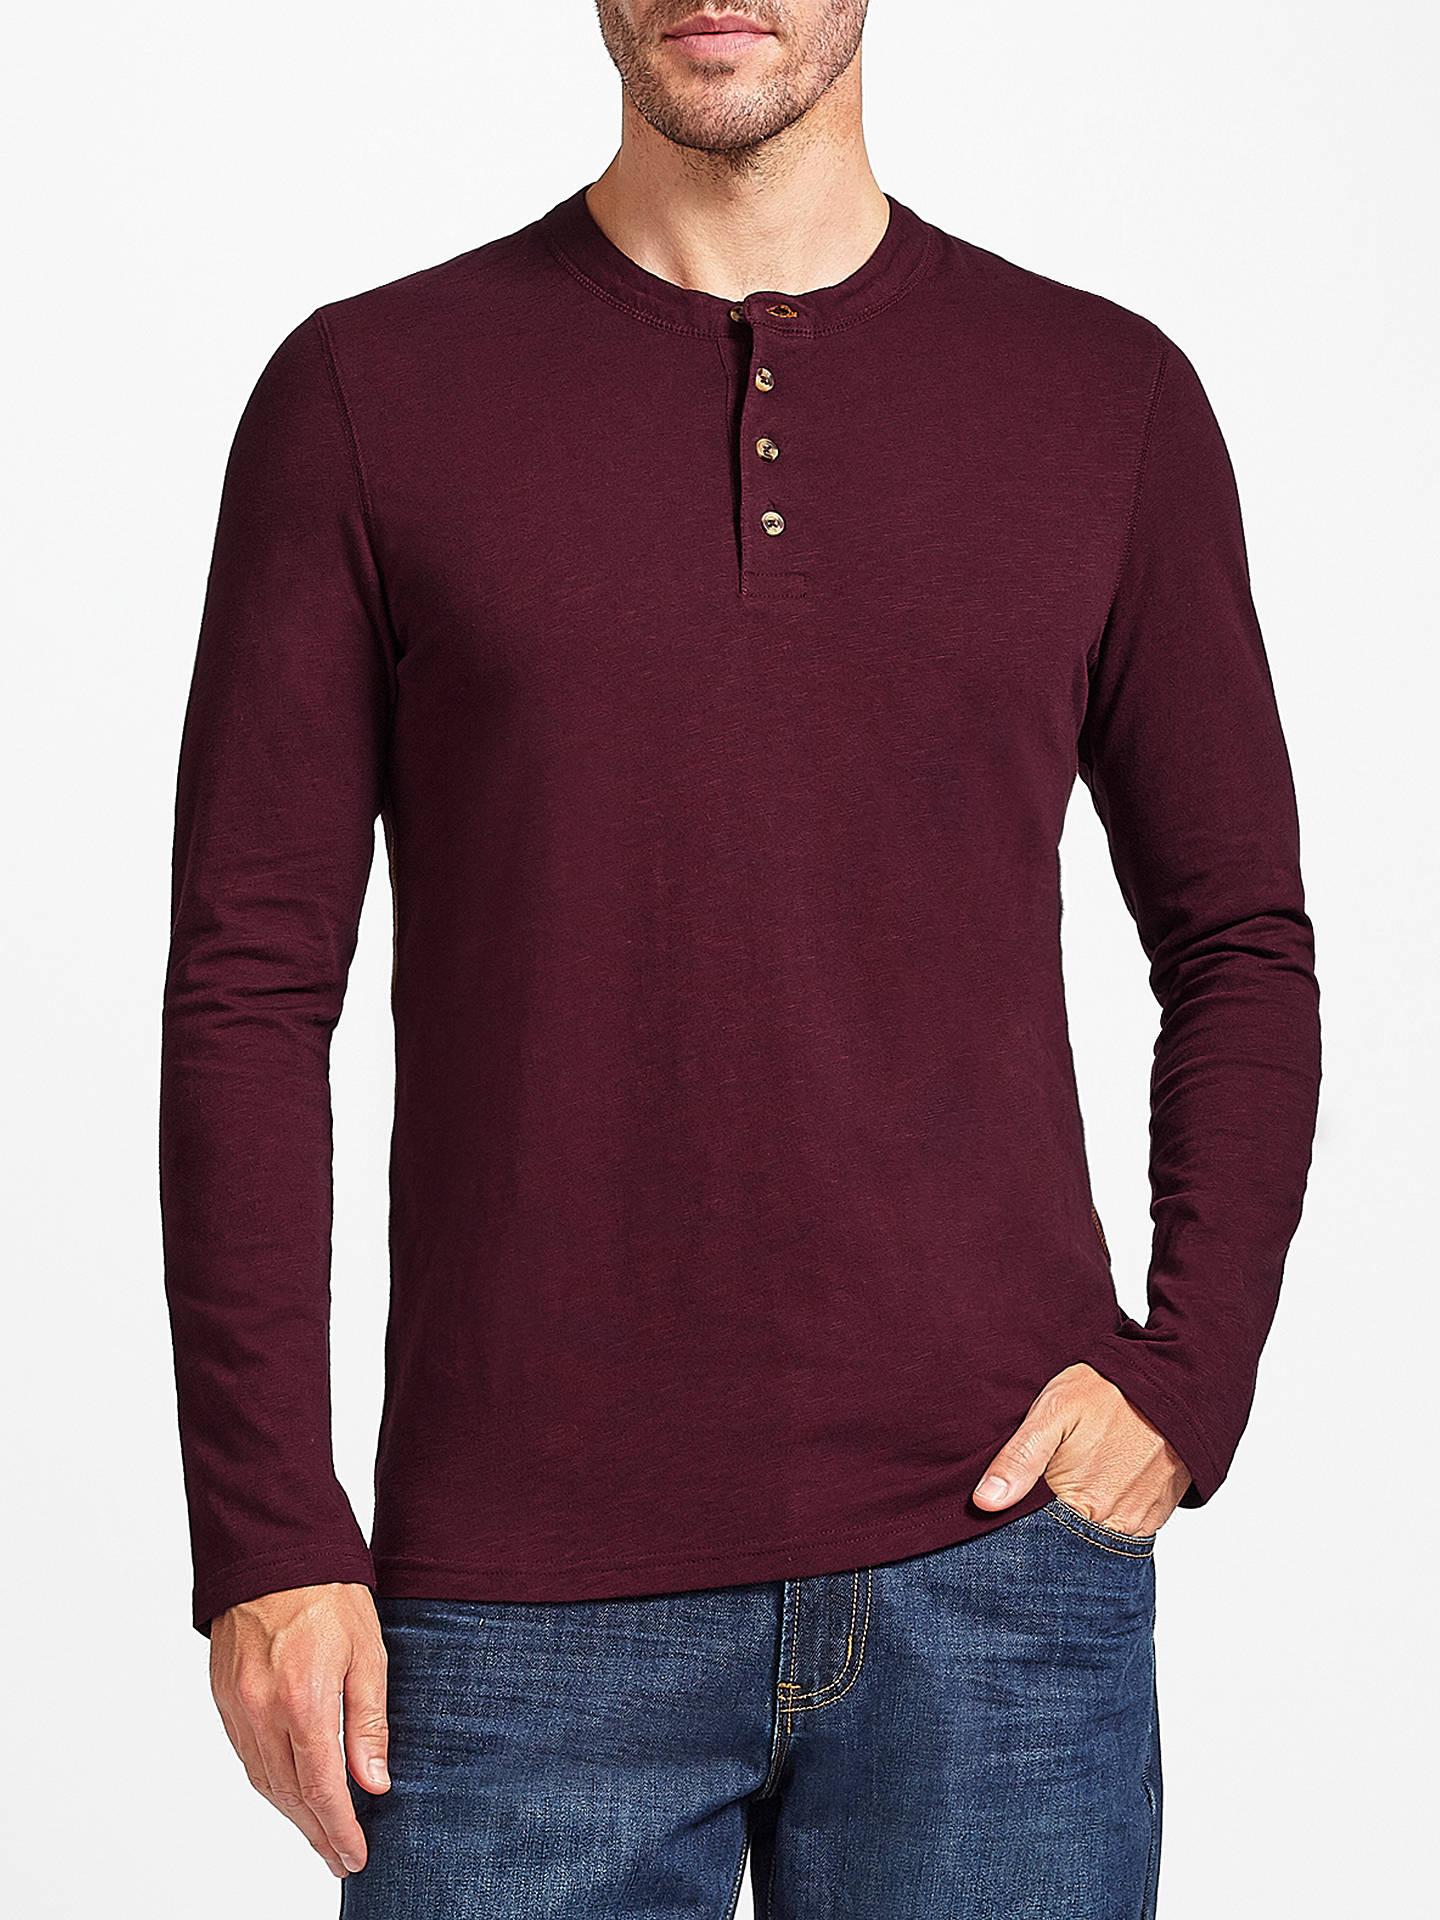 76cf26ae45 John Lewis Plain Slub Cotton Henley T-Shirt at John Lewis & Partners